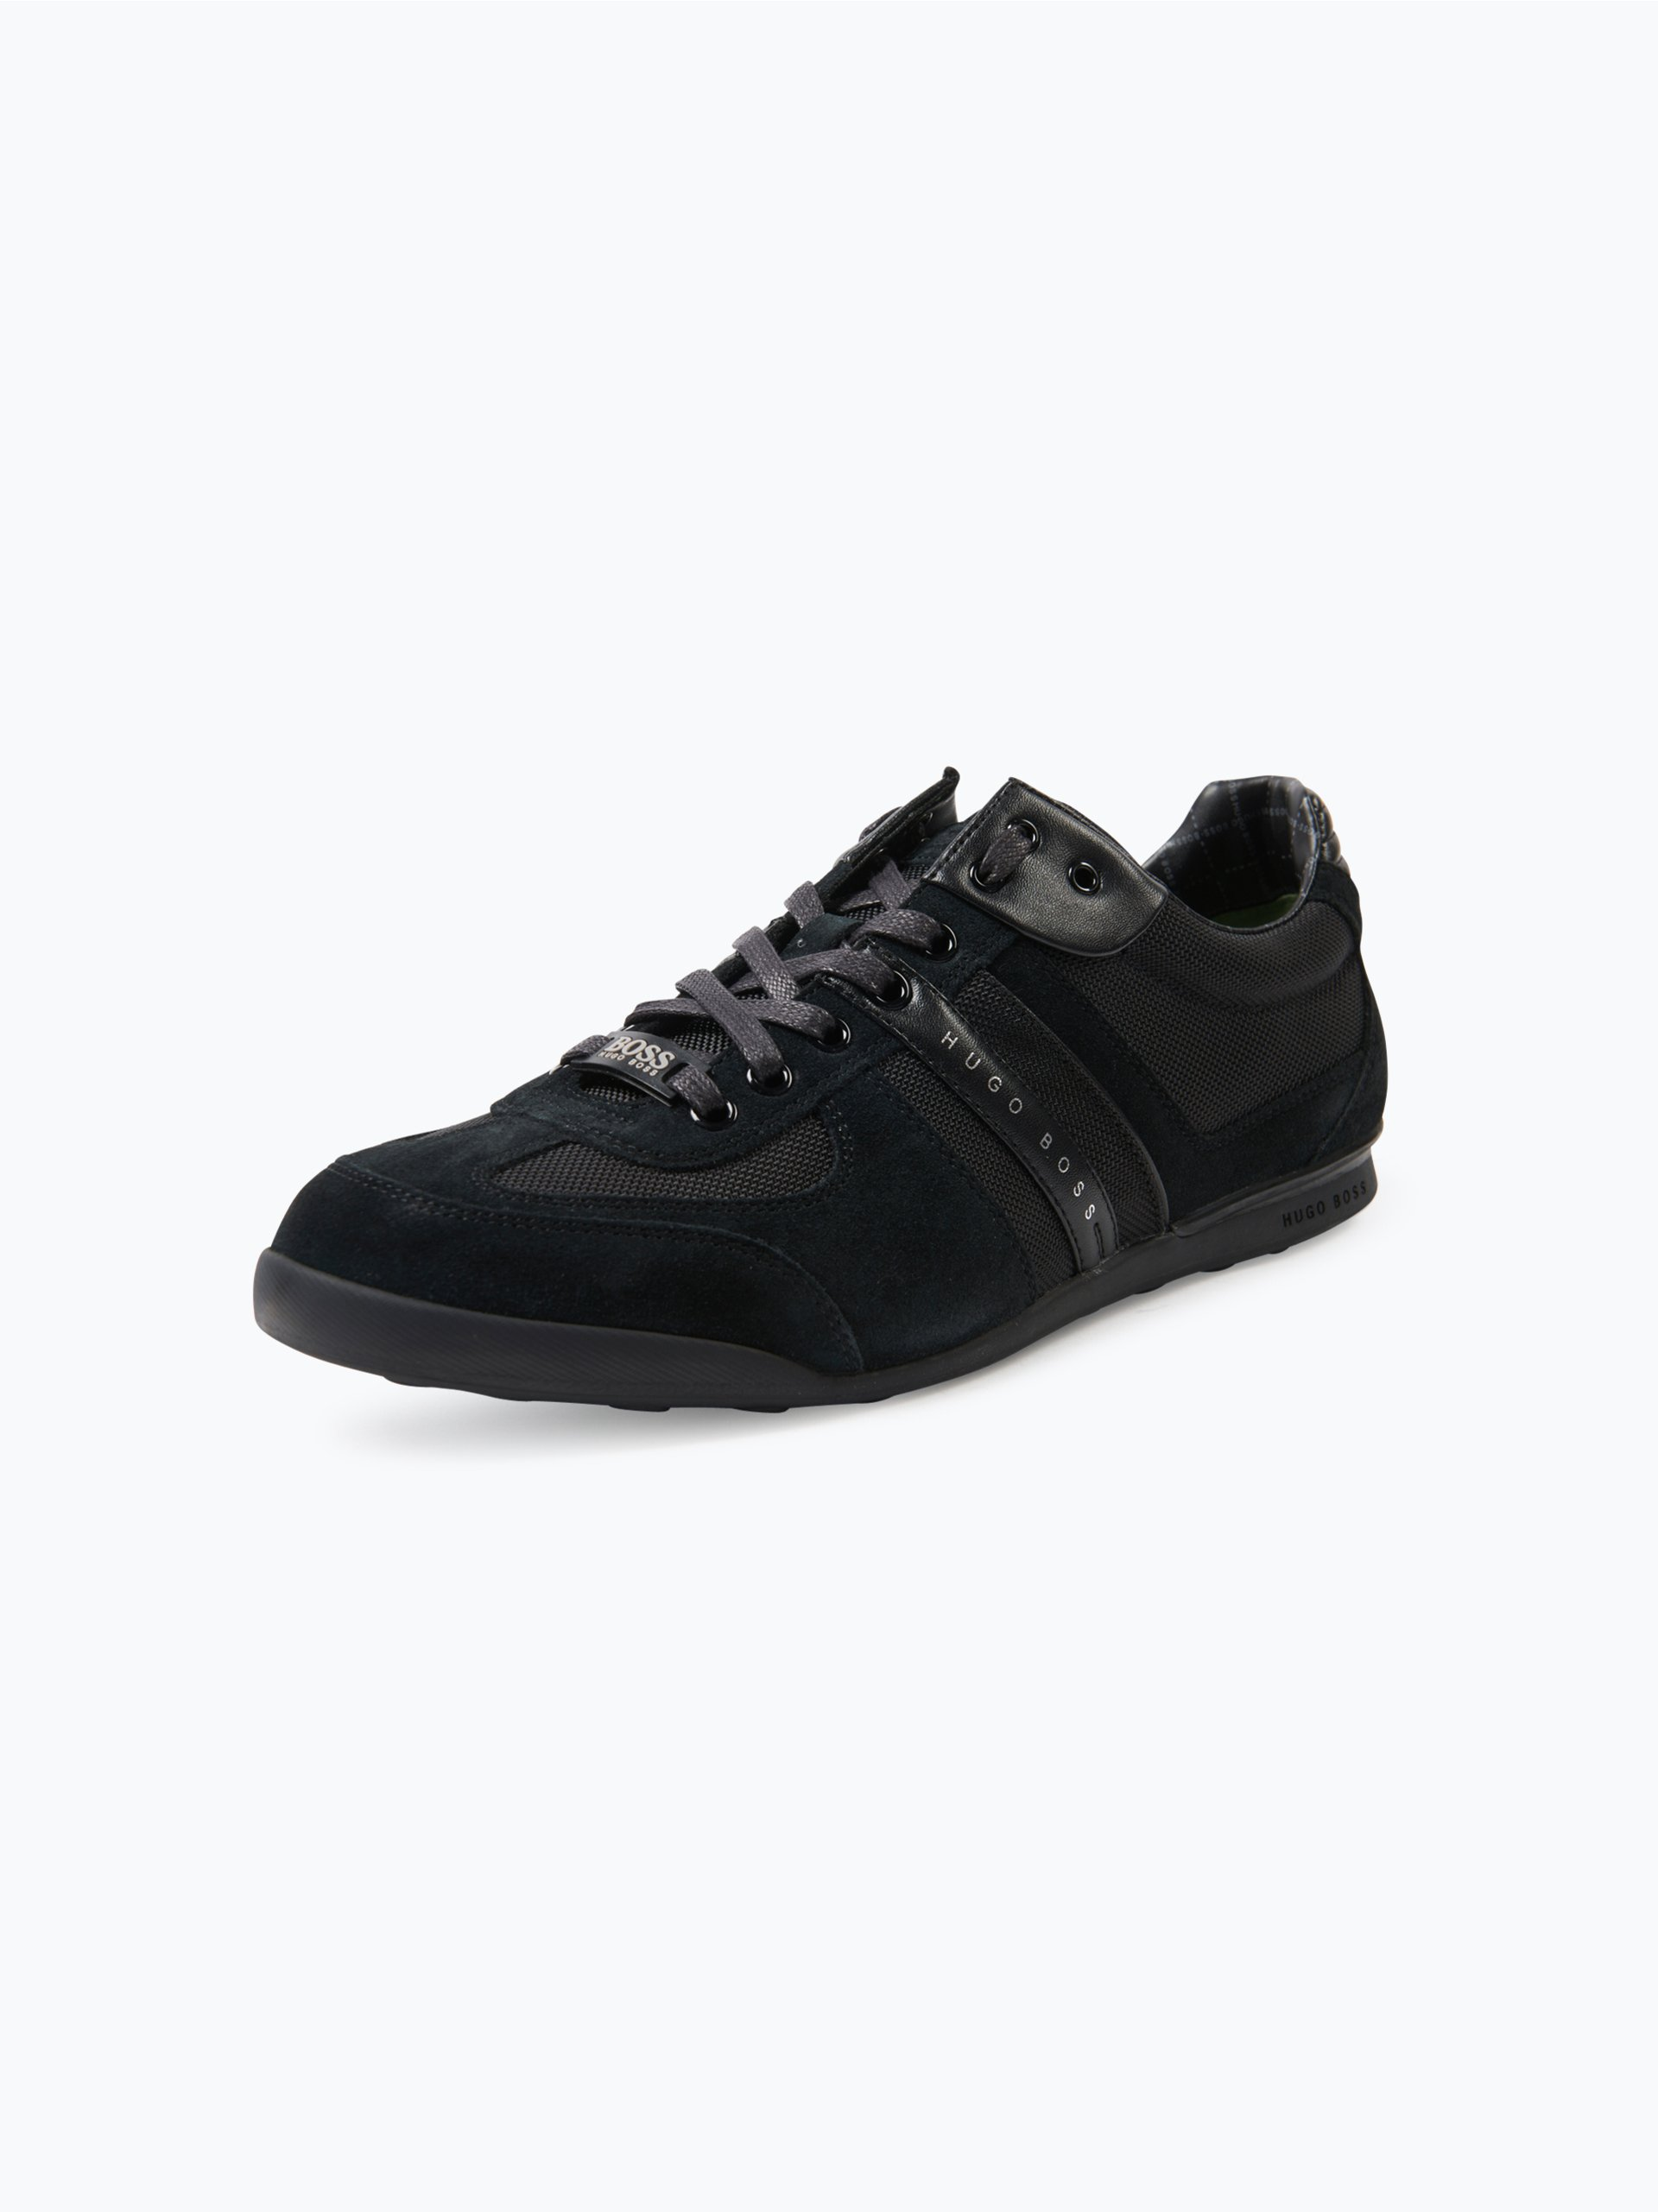 BOSS Athleisure Herren Sneaker mit Leder-Besatz - Akeen